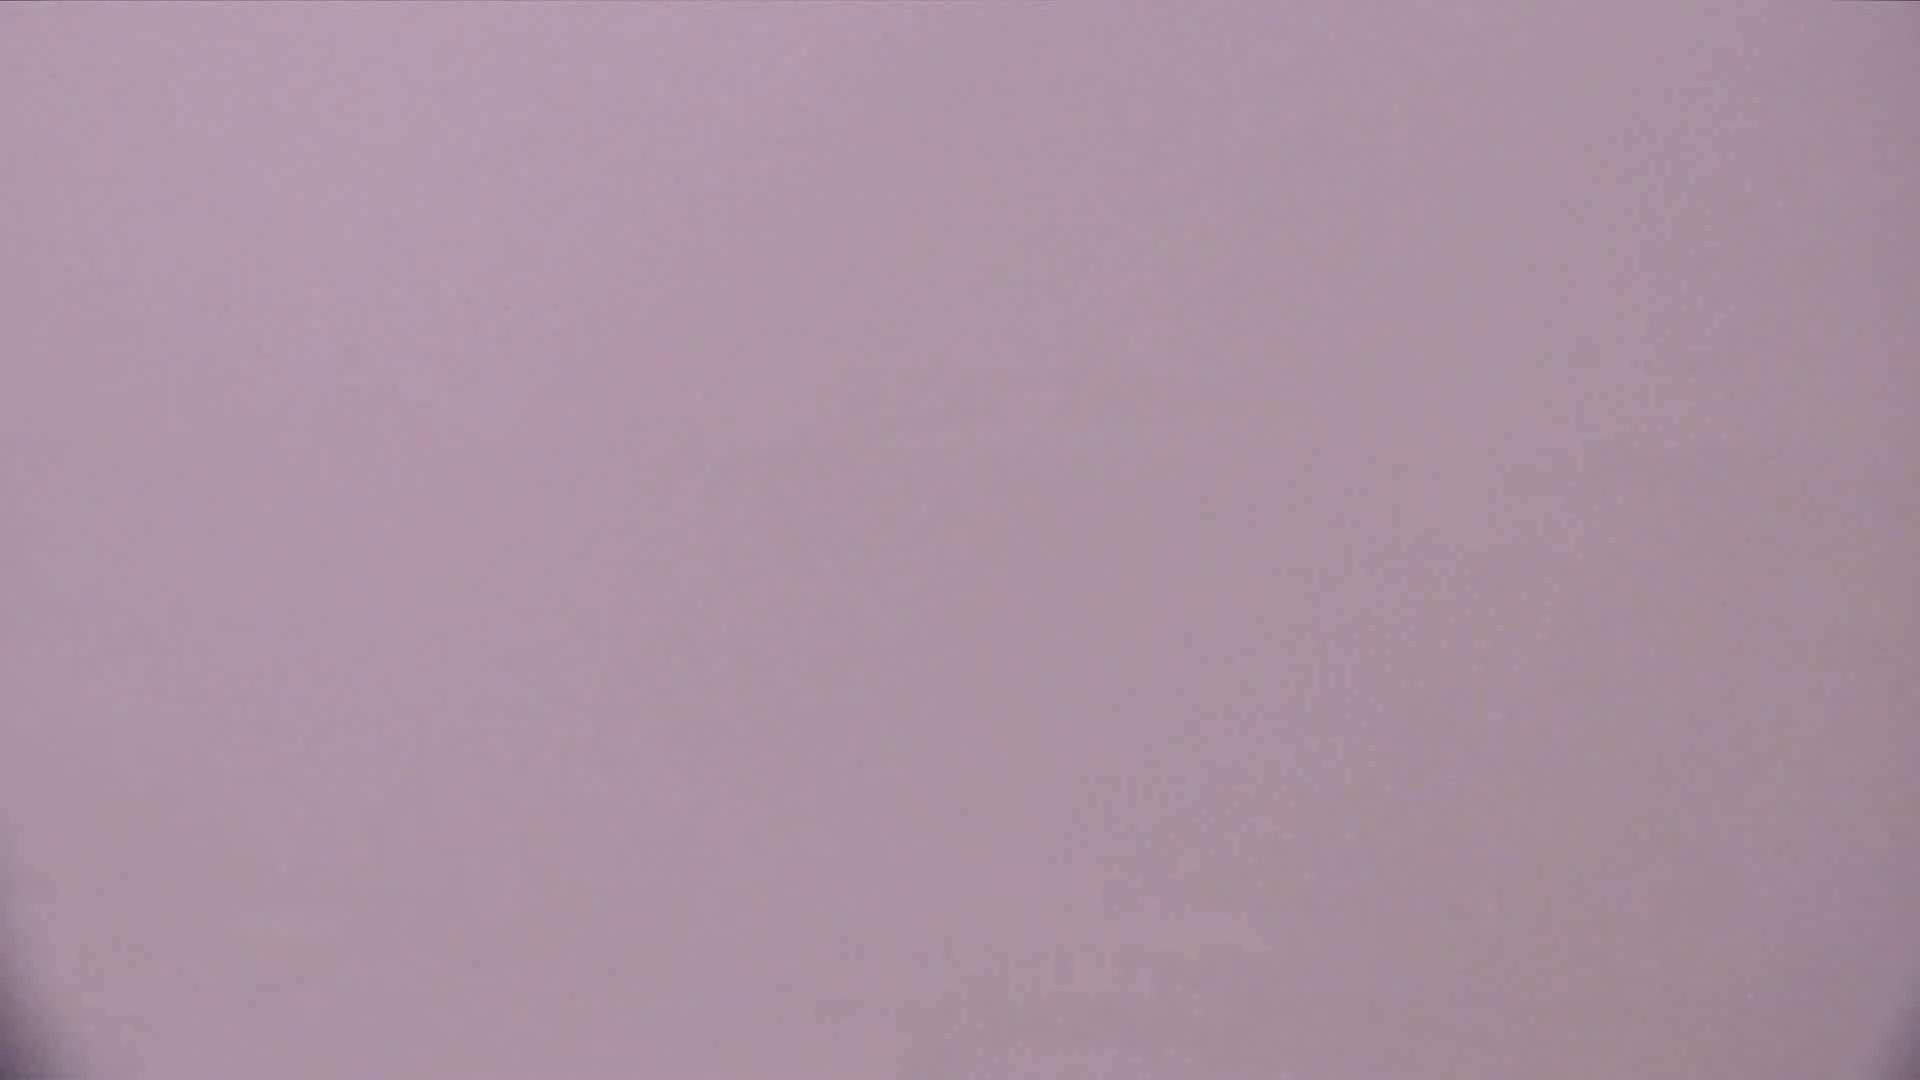 vol.15 命がけ潜伏洗面所! 肌荒れ注意報!! プライベート 隠し撮りすけべAV動画紹介 102画像 63